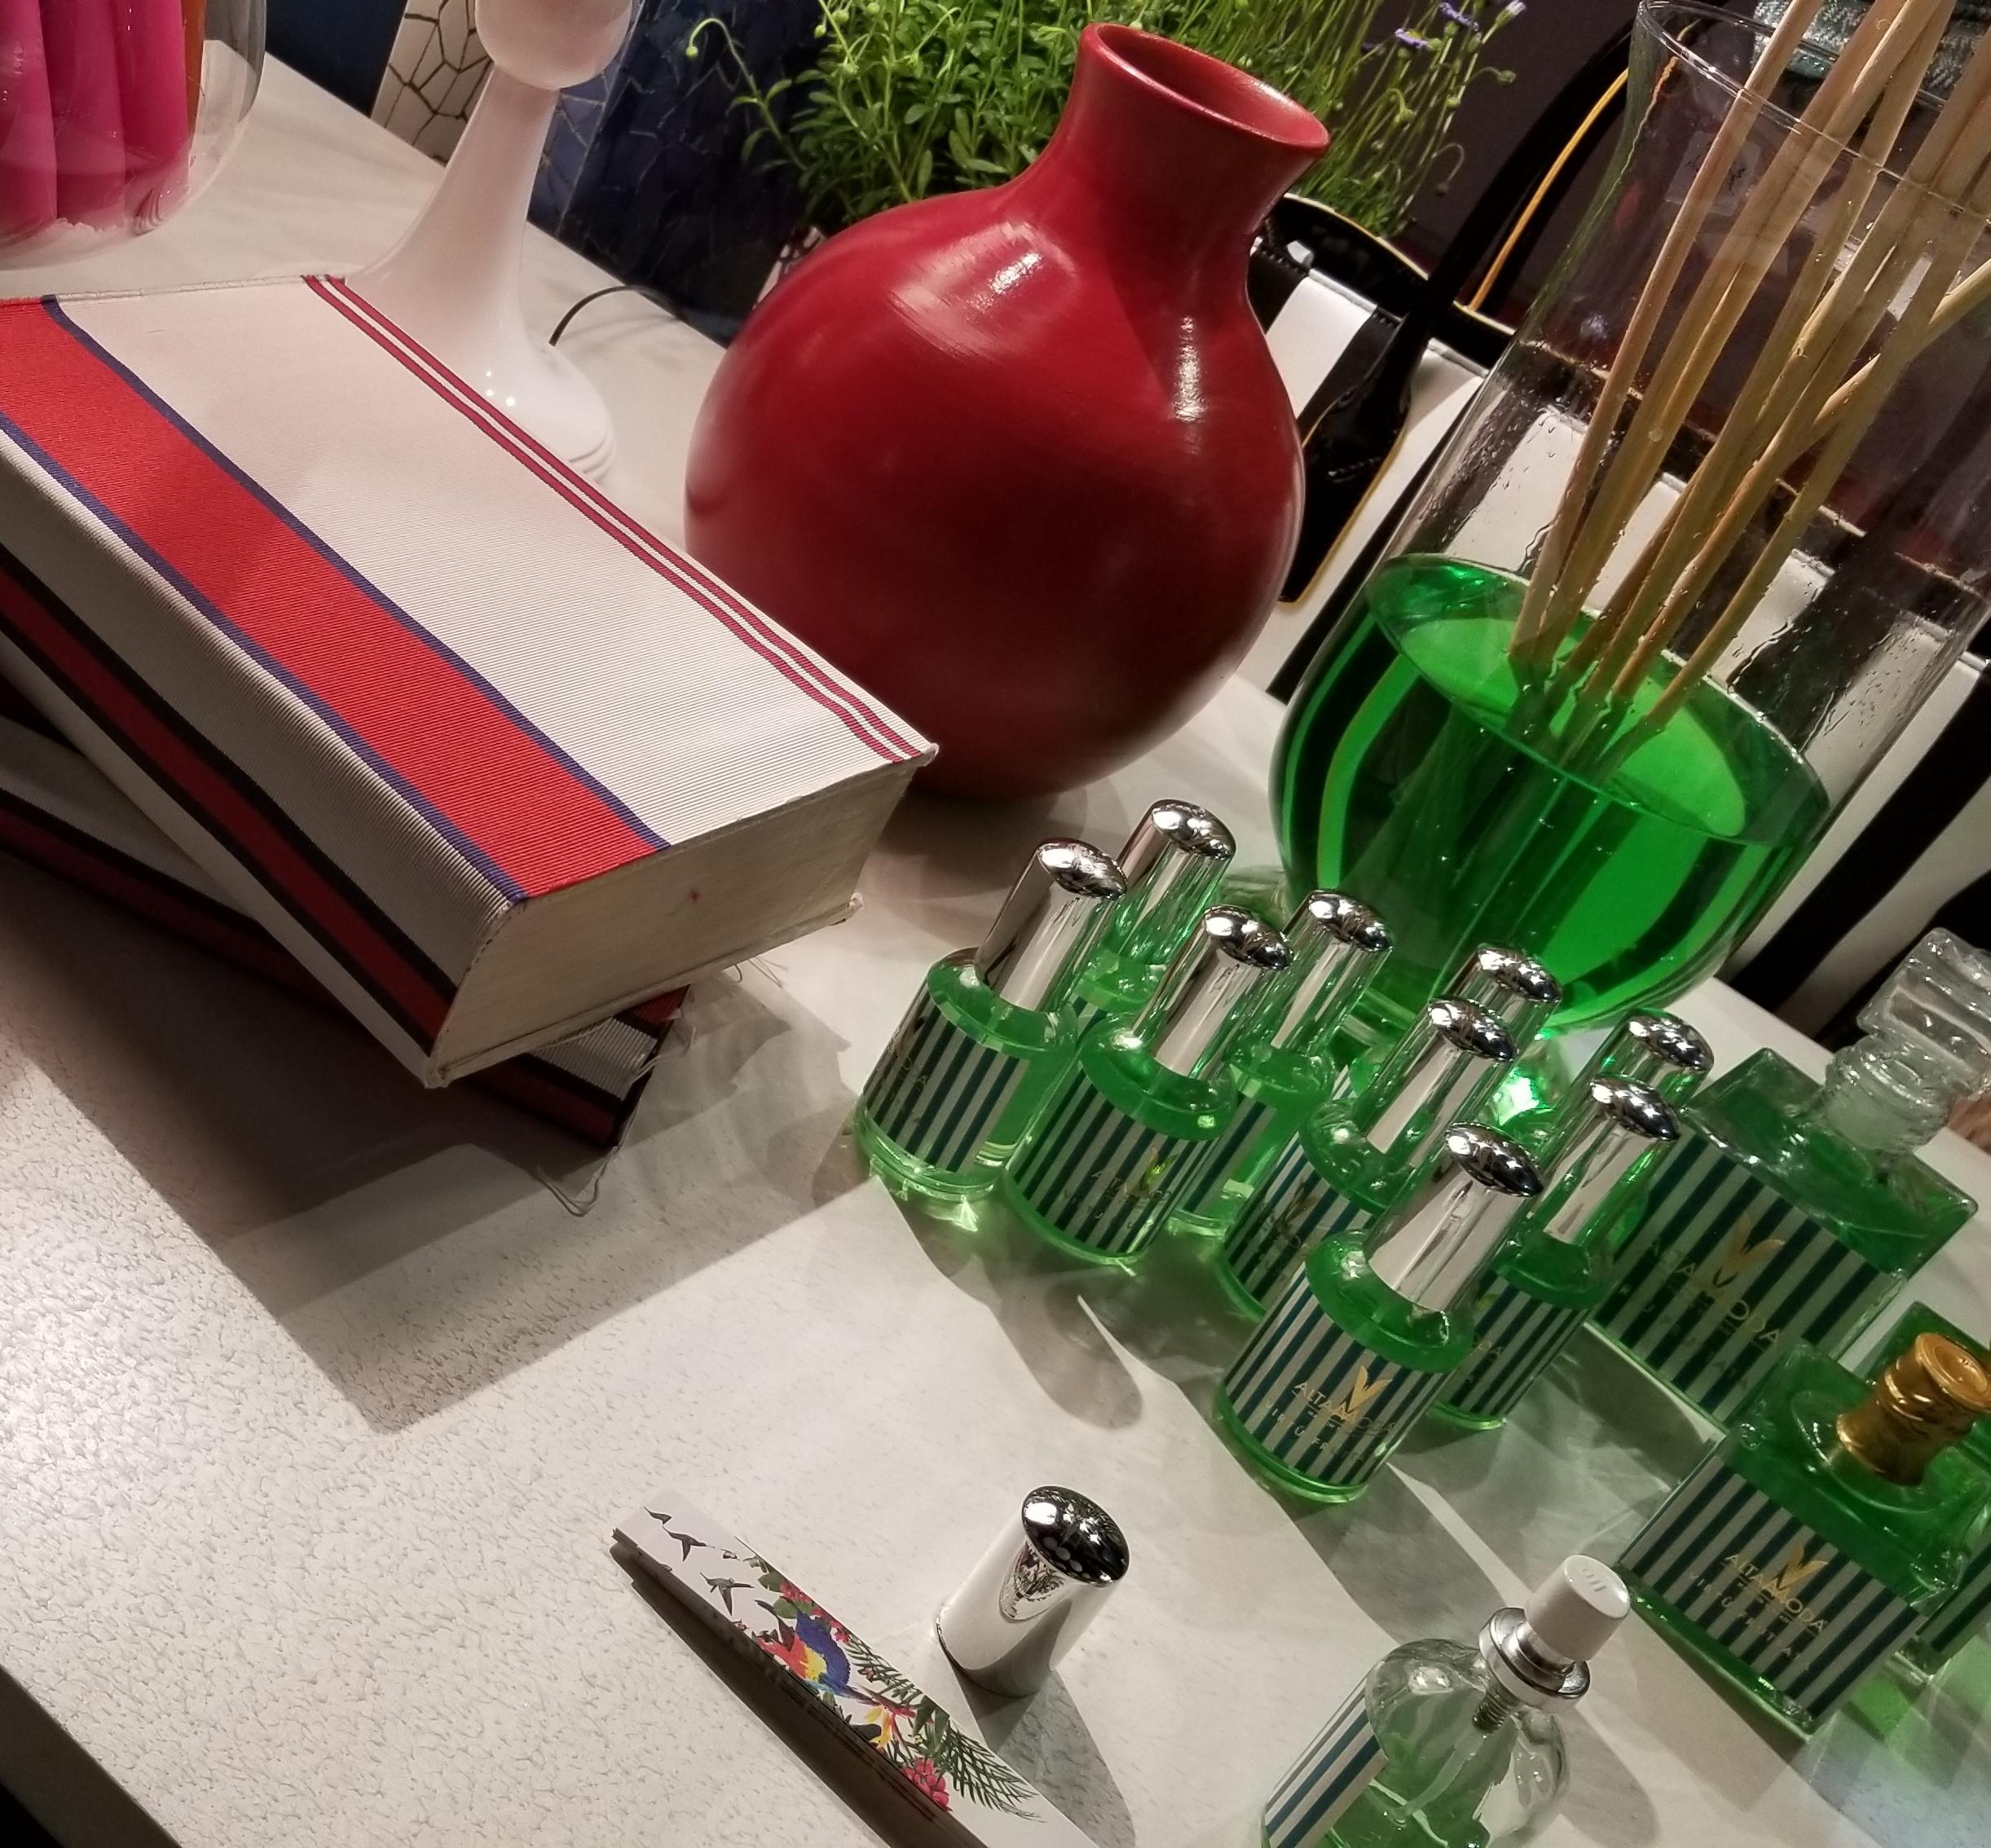 stefania volpi. altamoda italia, salon del mobile, milan, made in italy, helen siwak, ecoluxluv, folioyvr, vancouver, bc, vancity, 604